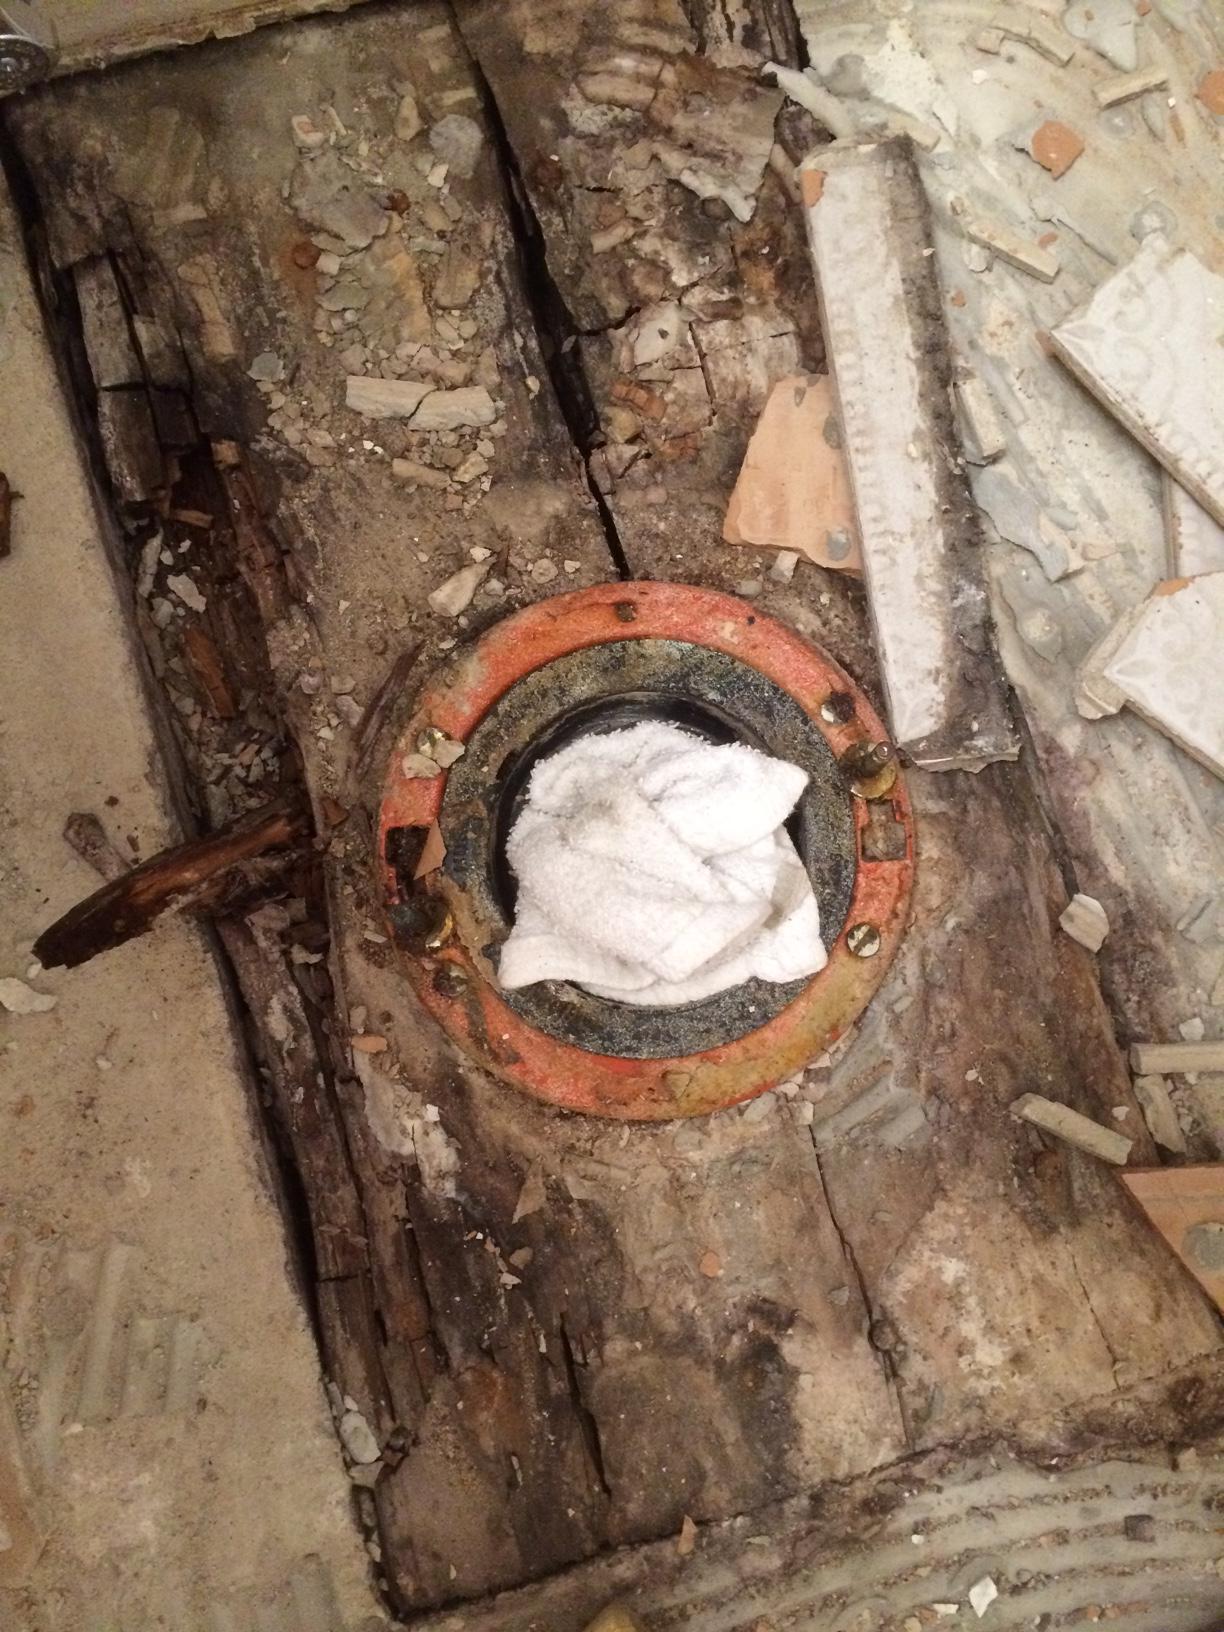 plumbing  How to prep gypcrete bathroom subfloor that has